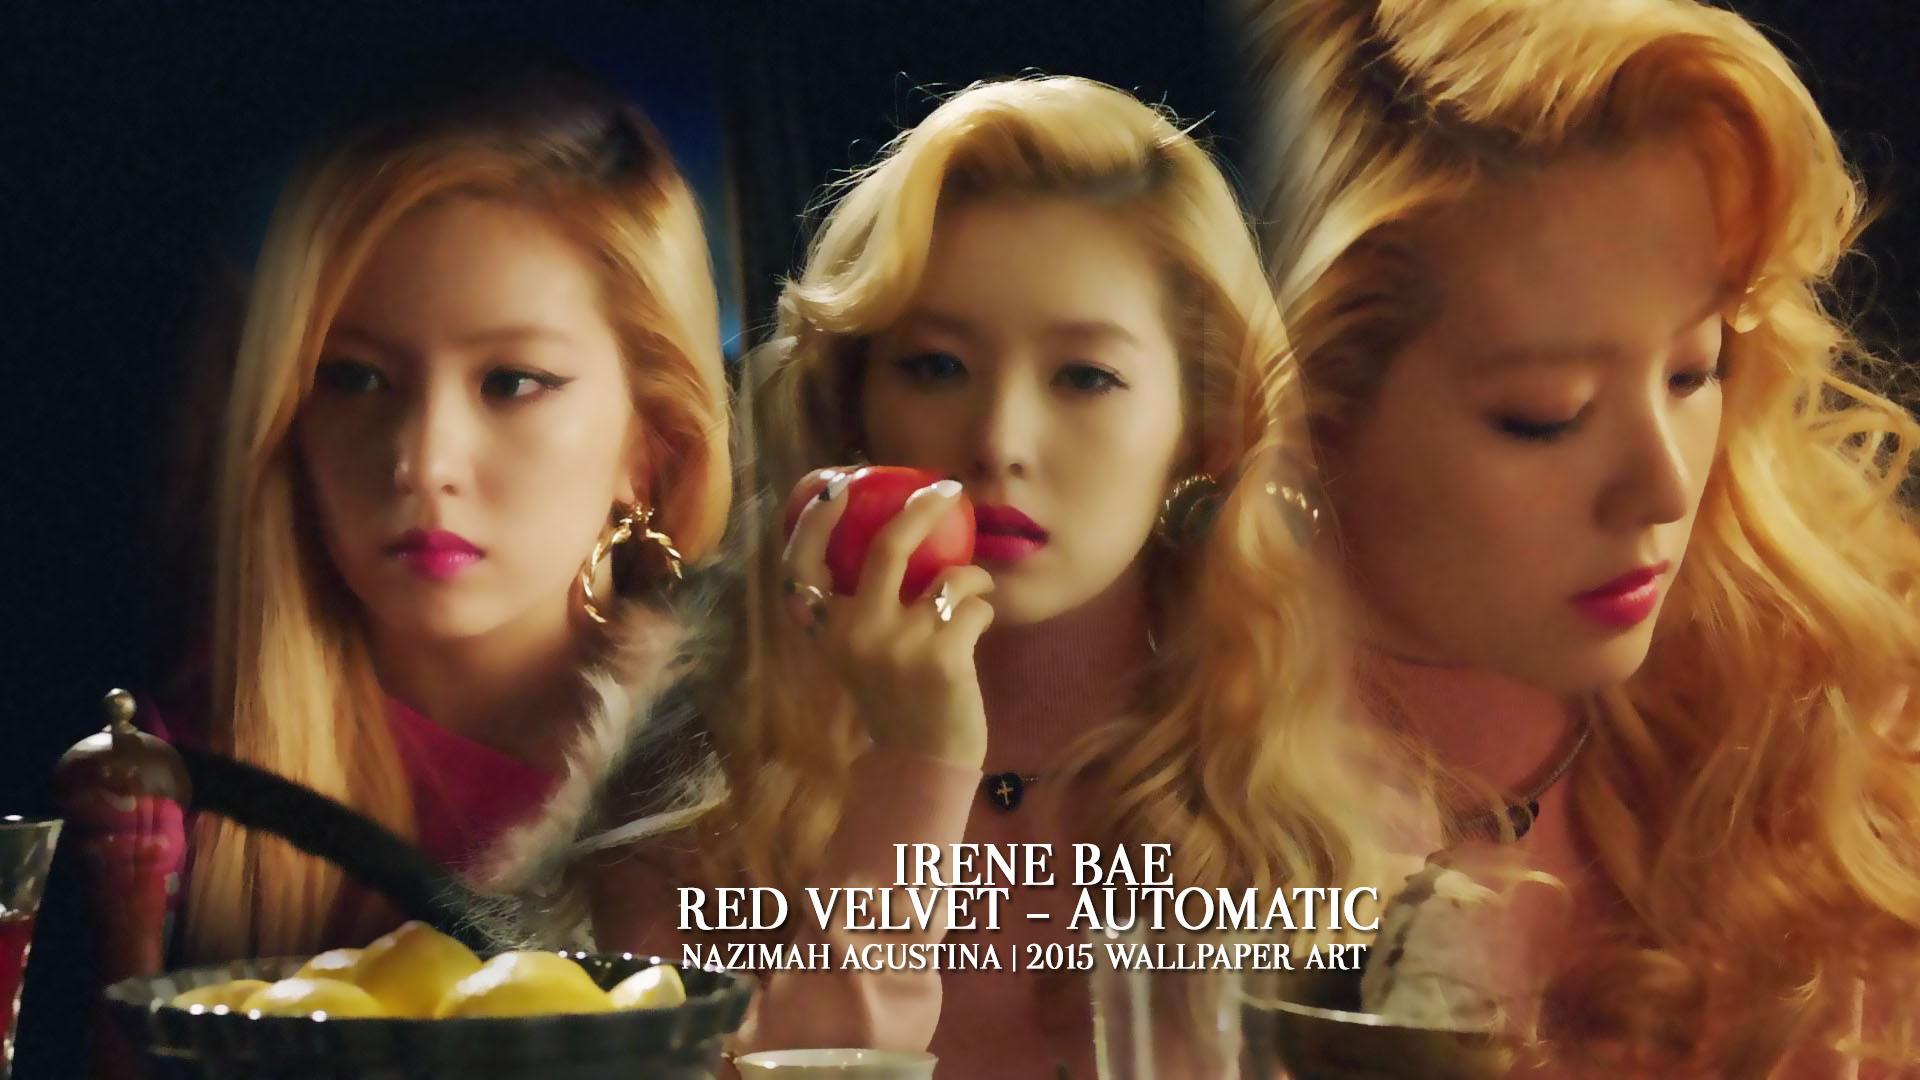 Irene Red Velvet Automatic 1920x1080 Download Hd Wallpaper Wallpapertip